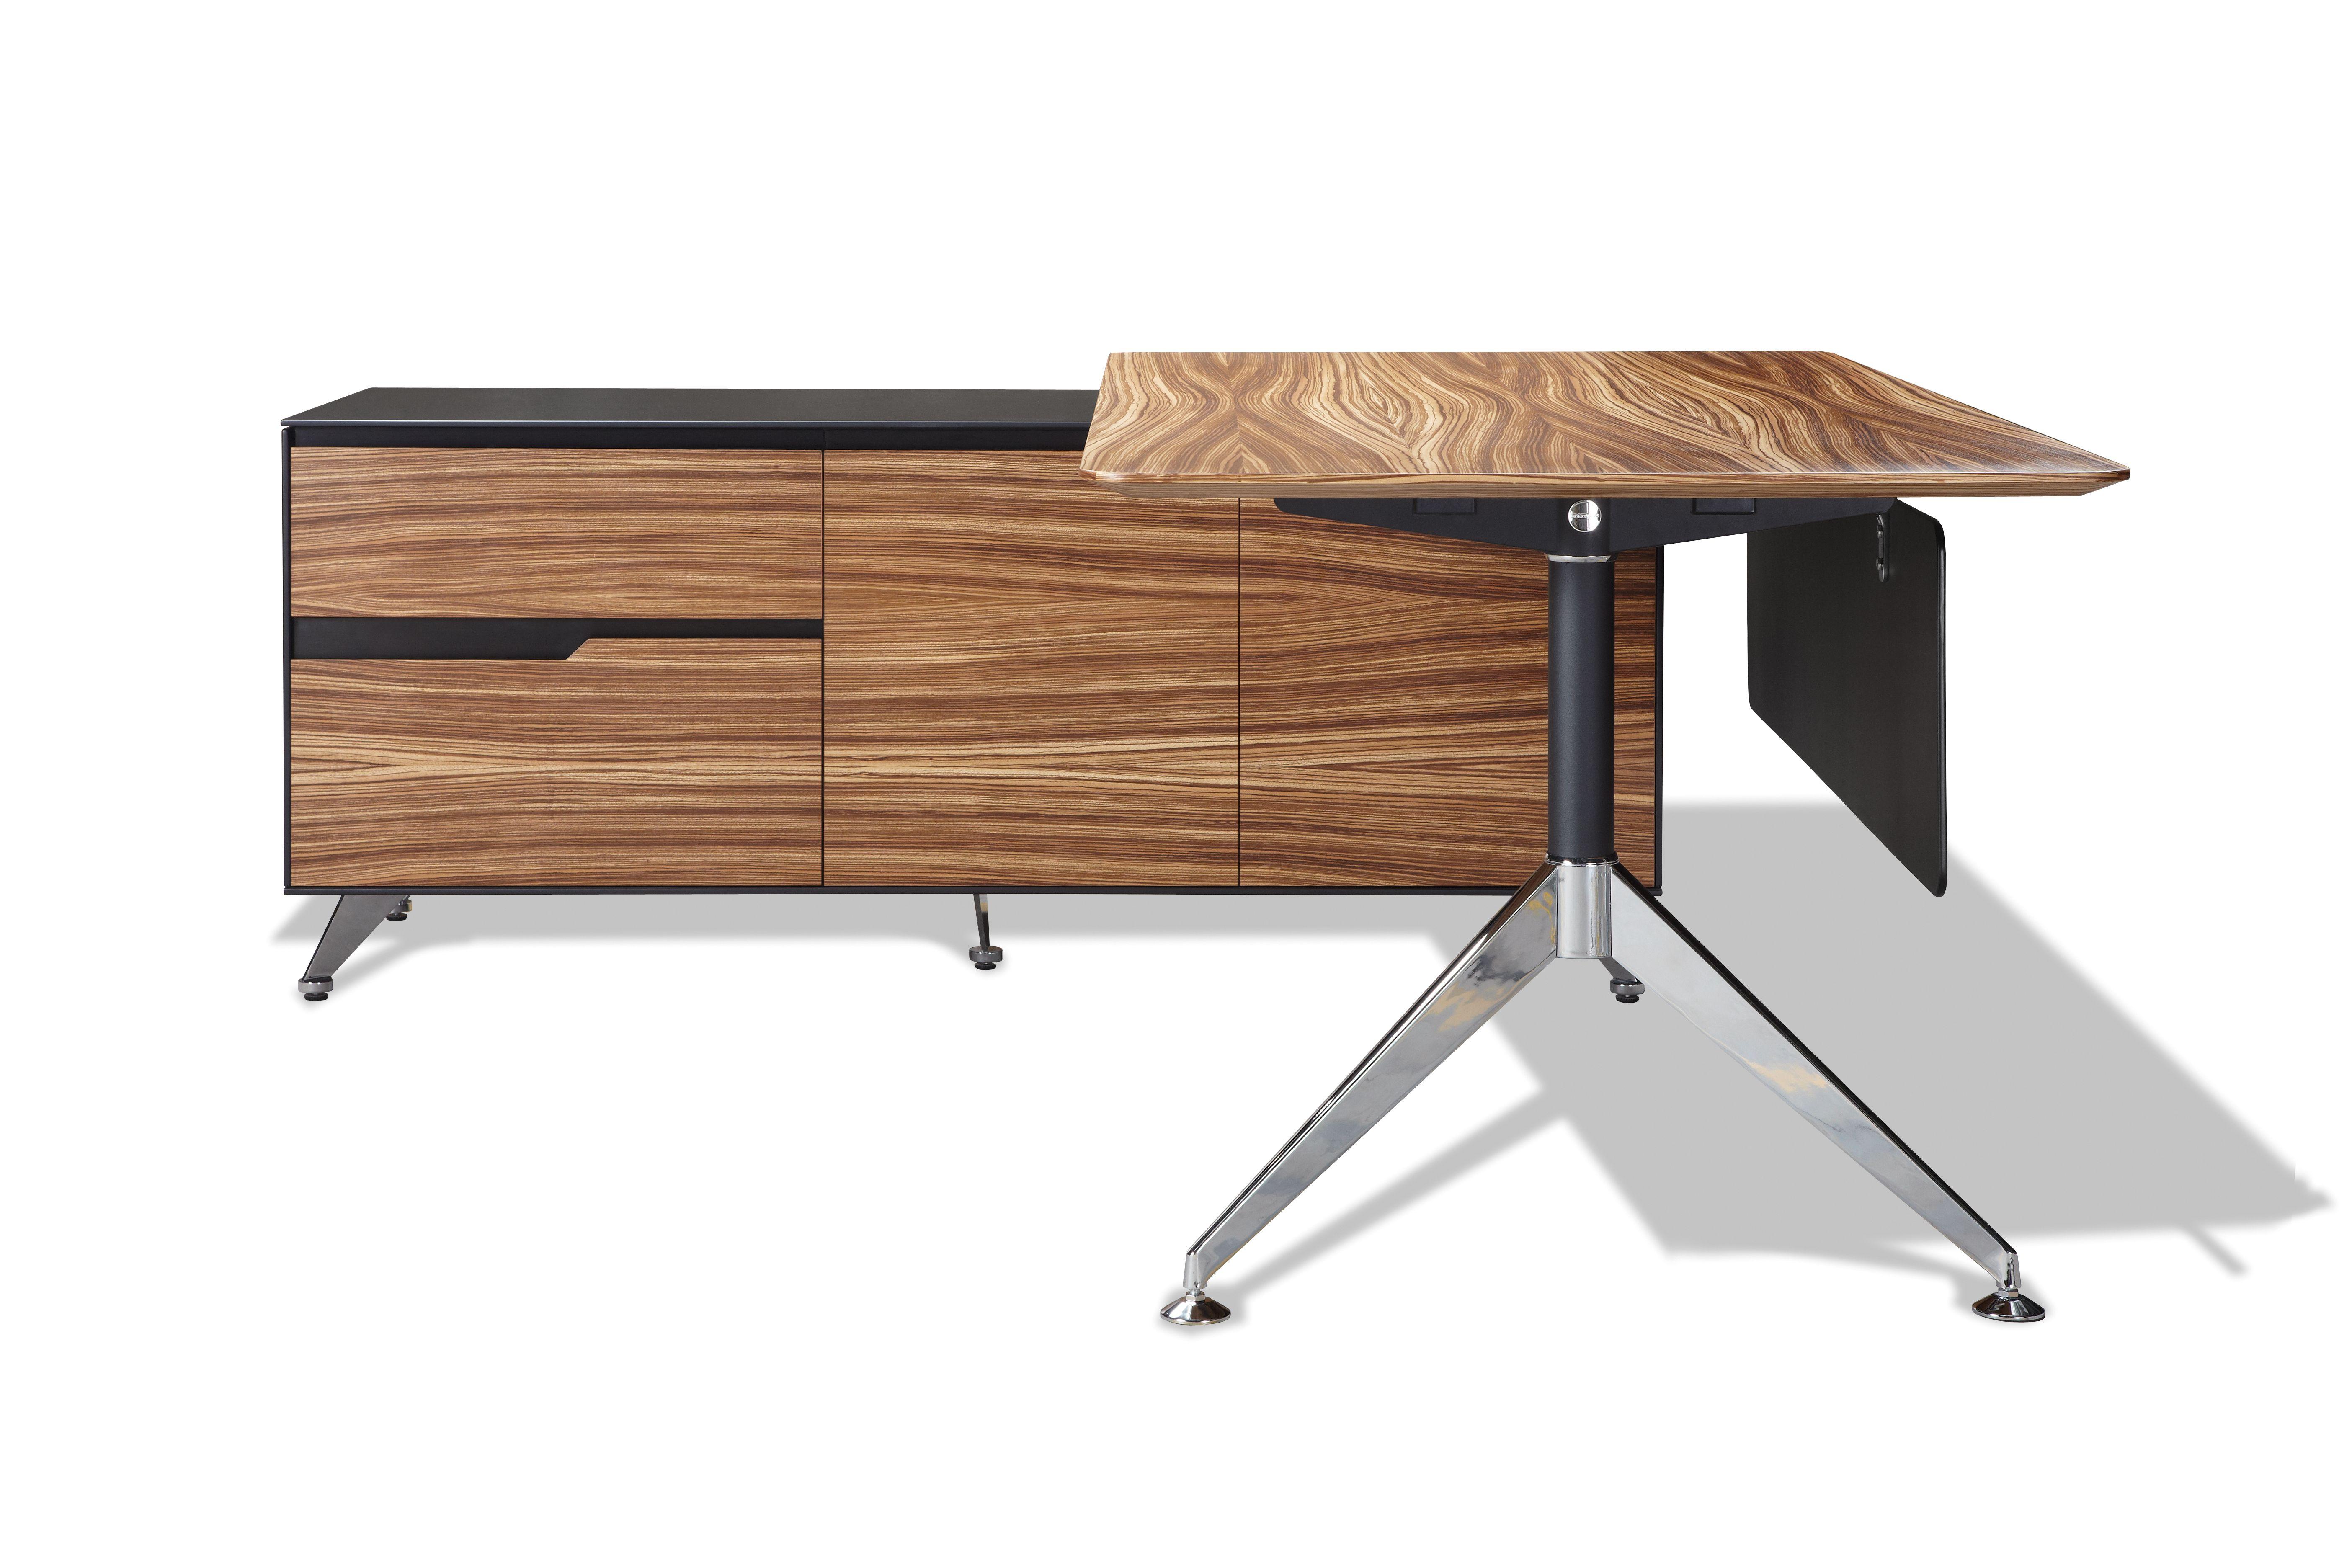 unique furniture 400 series 77 x 73 zebrano executive desk with rh pinterest com